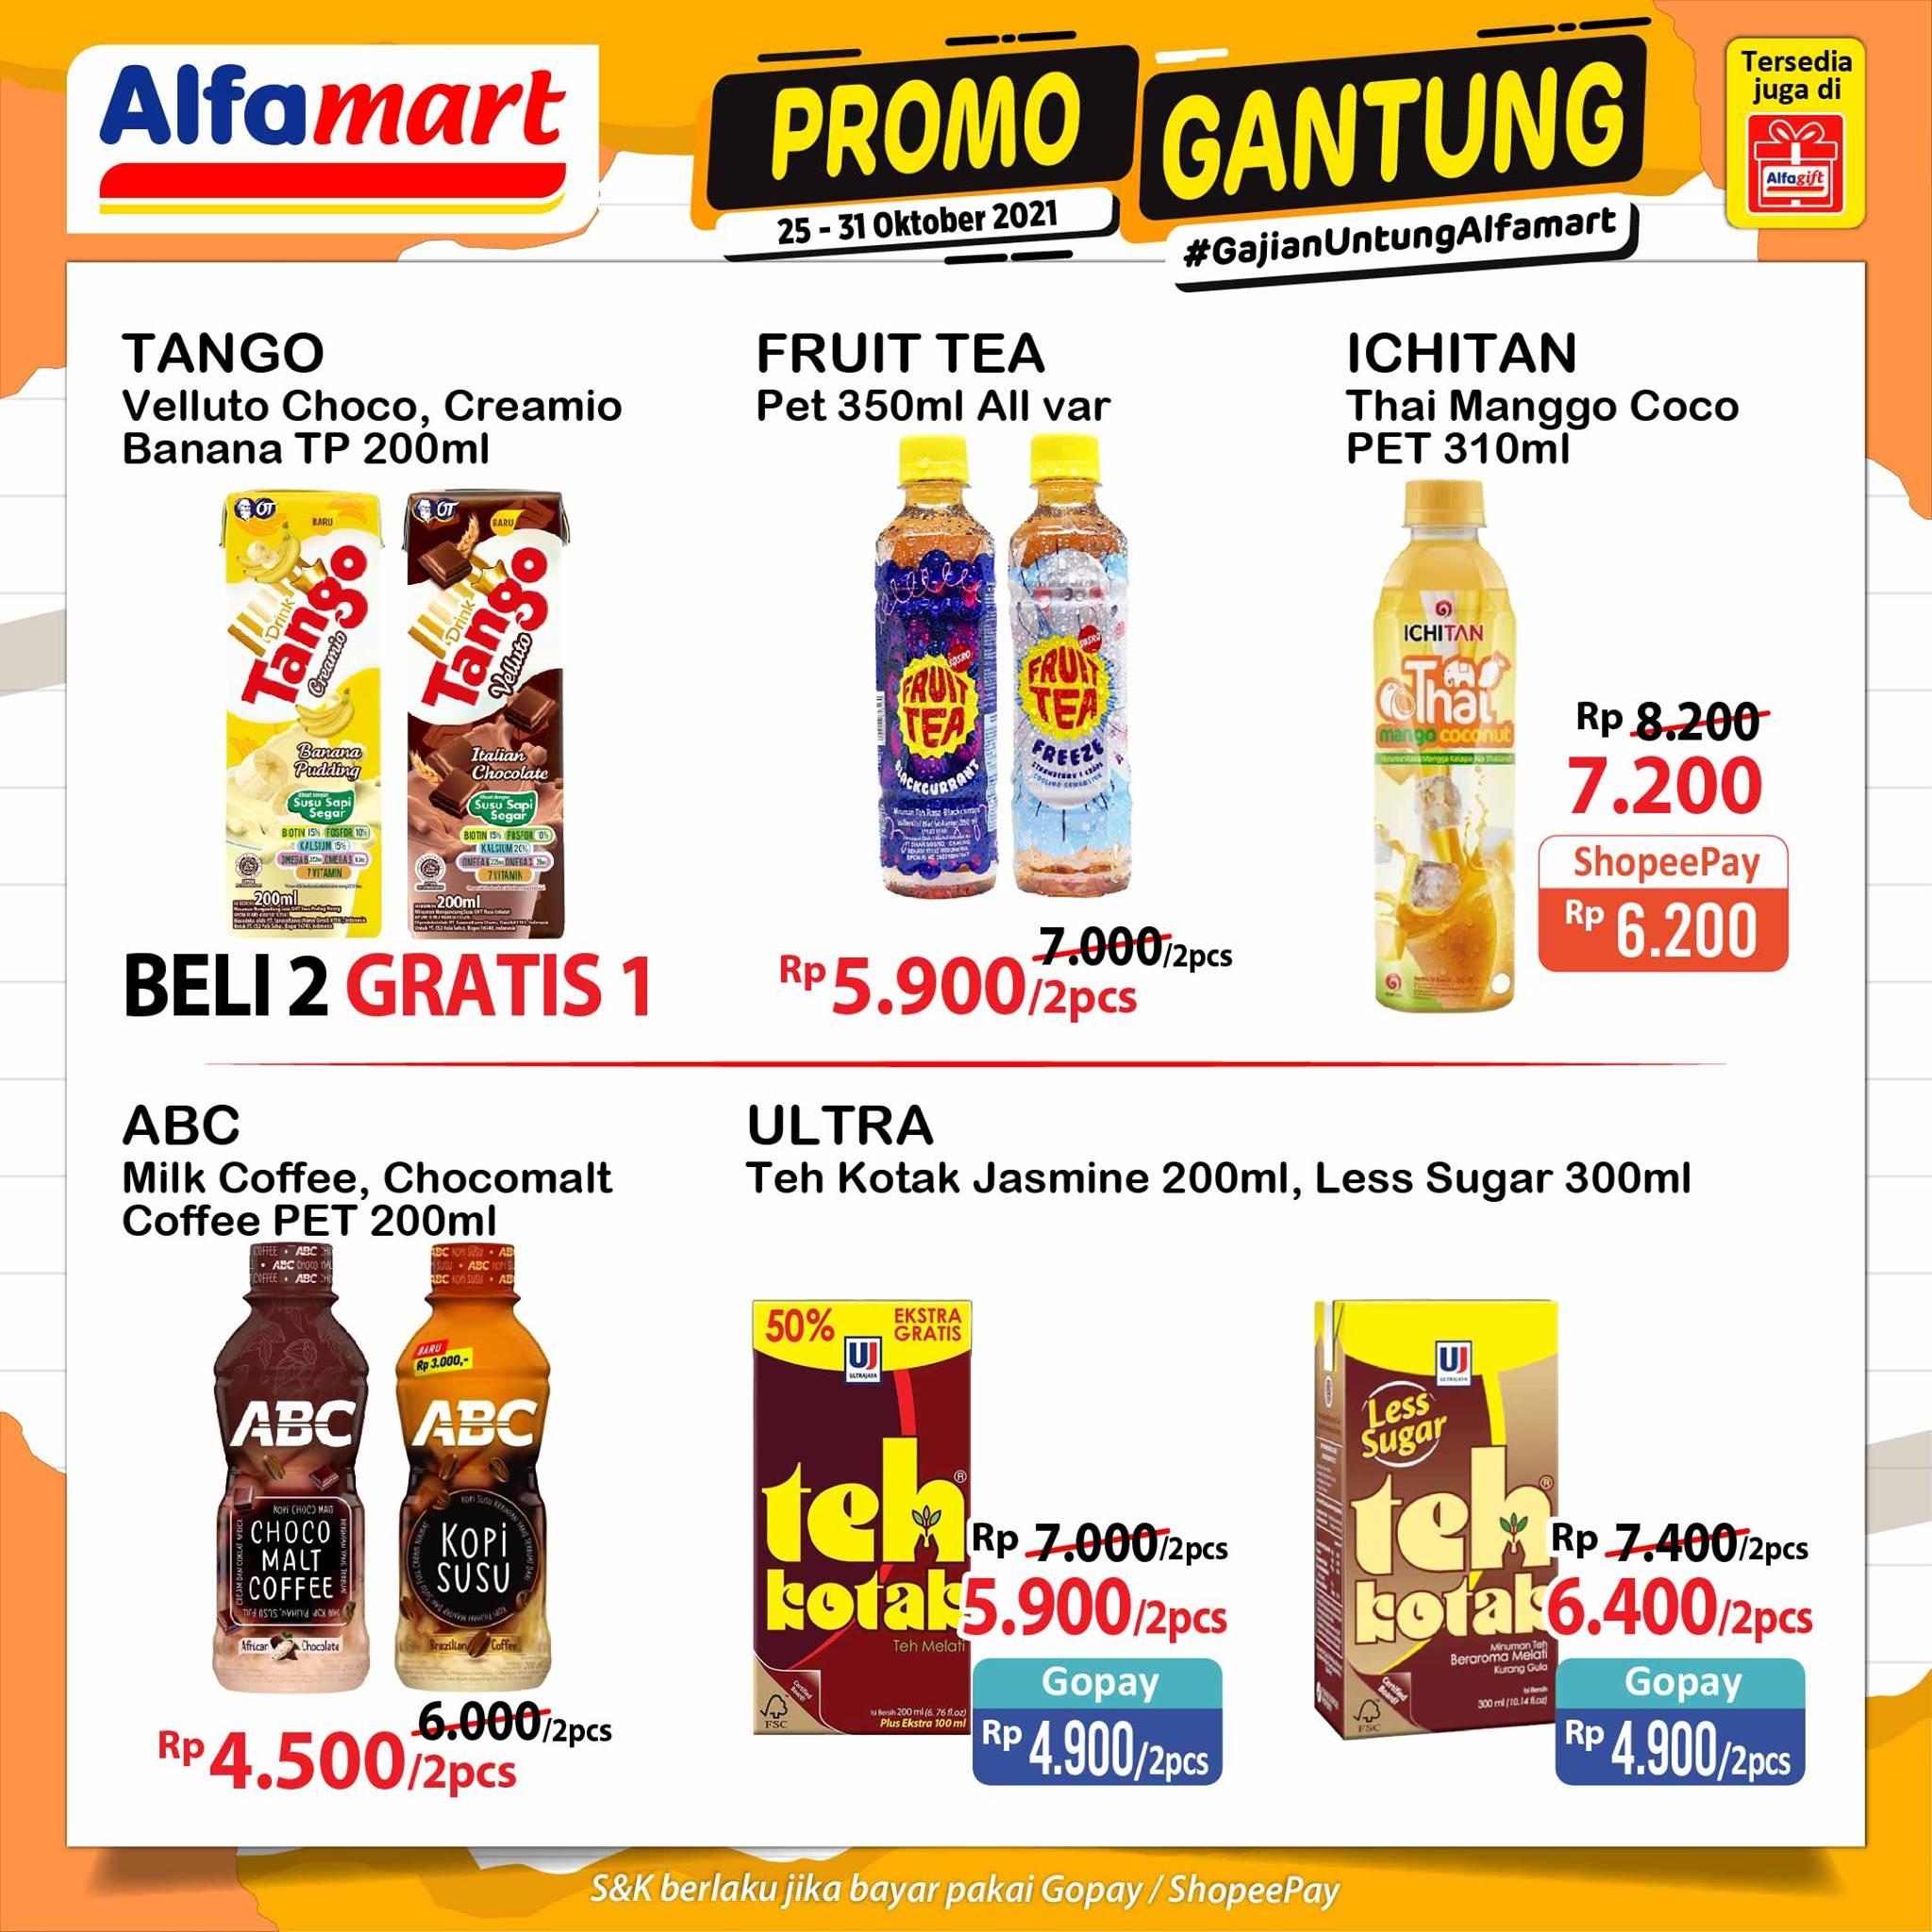 Promo GANTUNG ALFAMART / GAJIAN UNTUNG periode 25-31 Oktober 2021